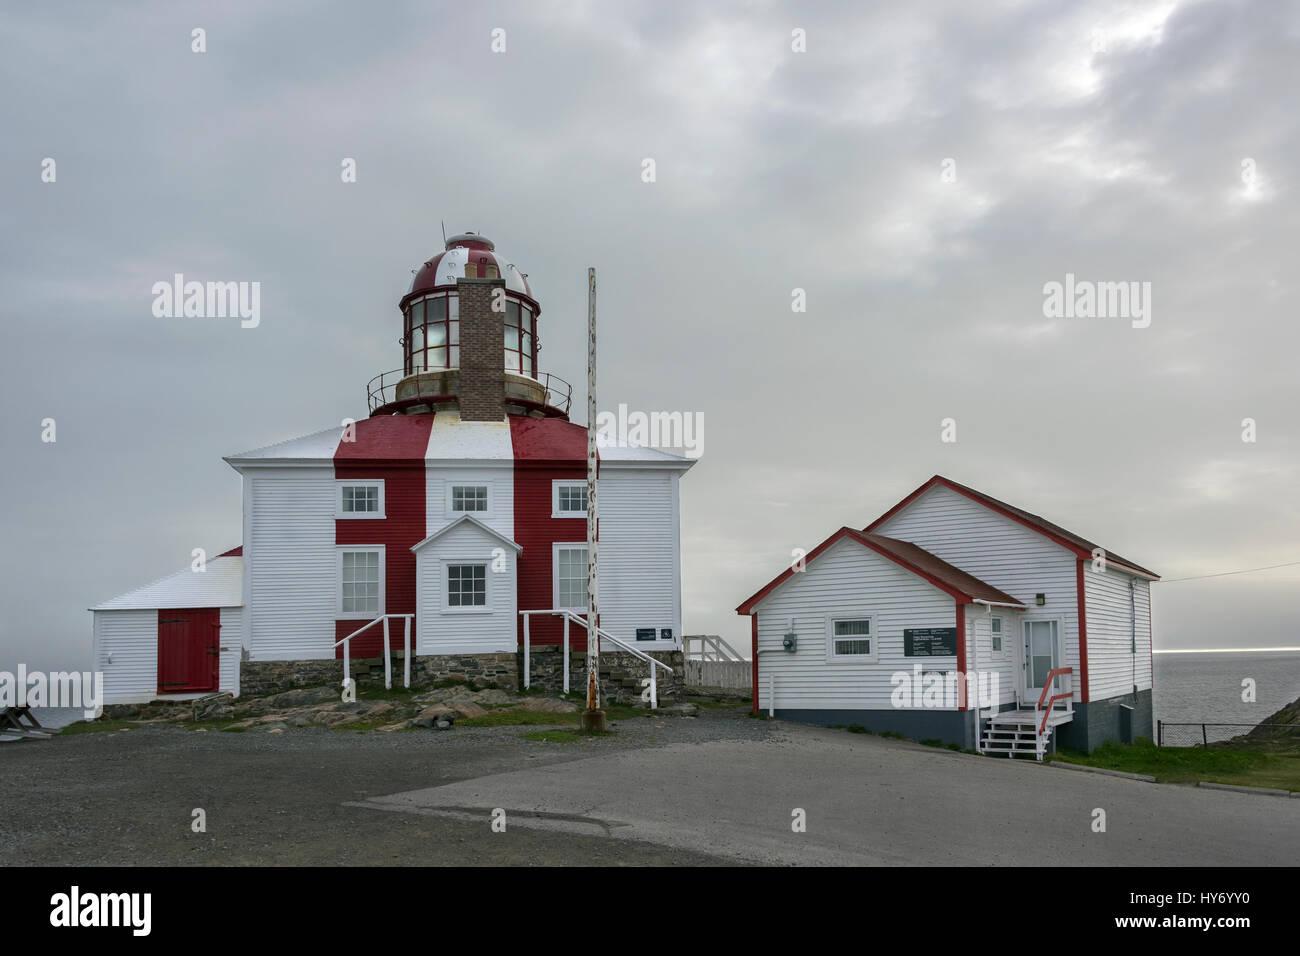 Early morning, Cape Bonavista Lighthouse Provincial Historic Site, Bonavista, Newfoundland - Stock Image